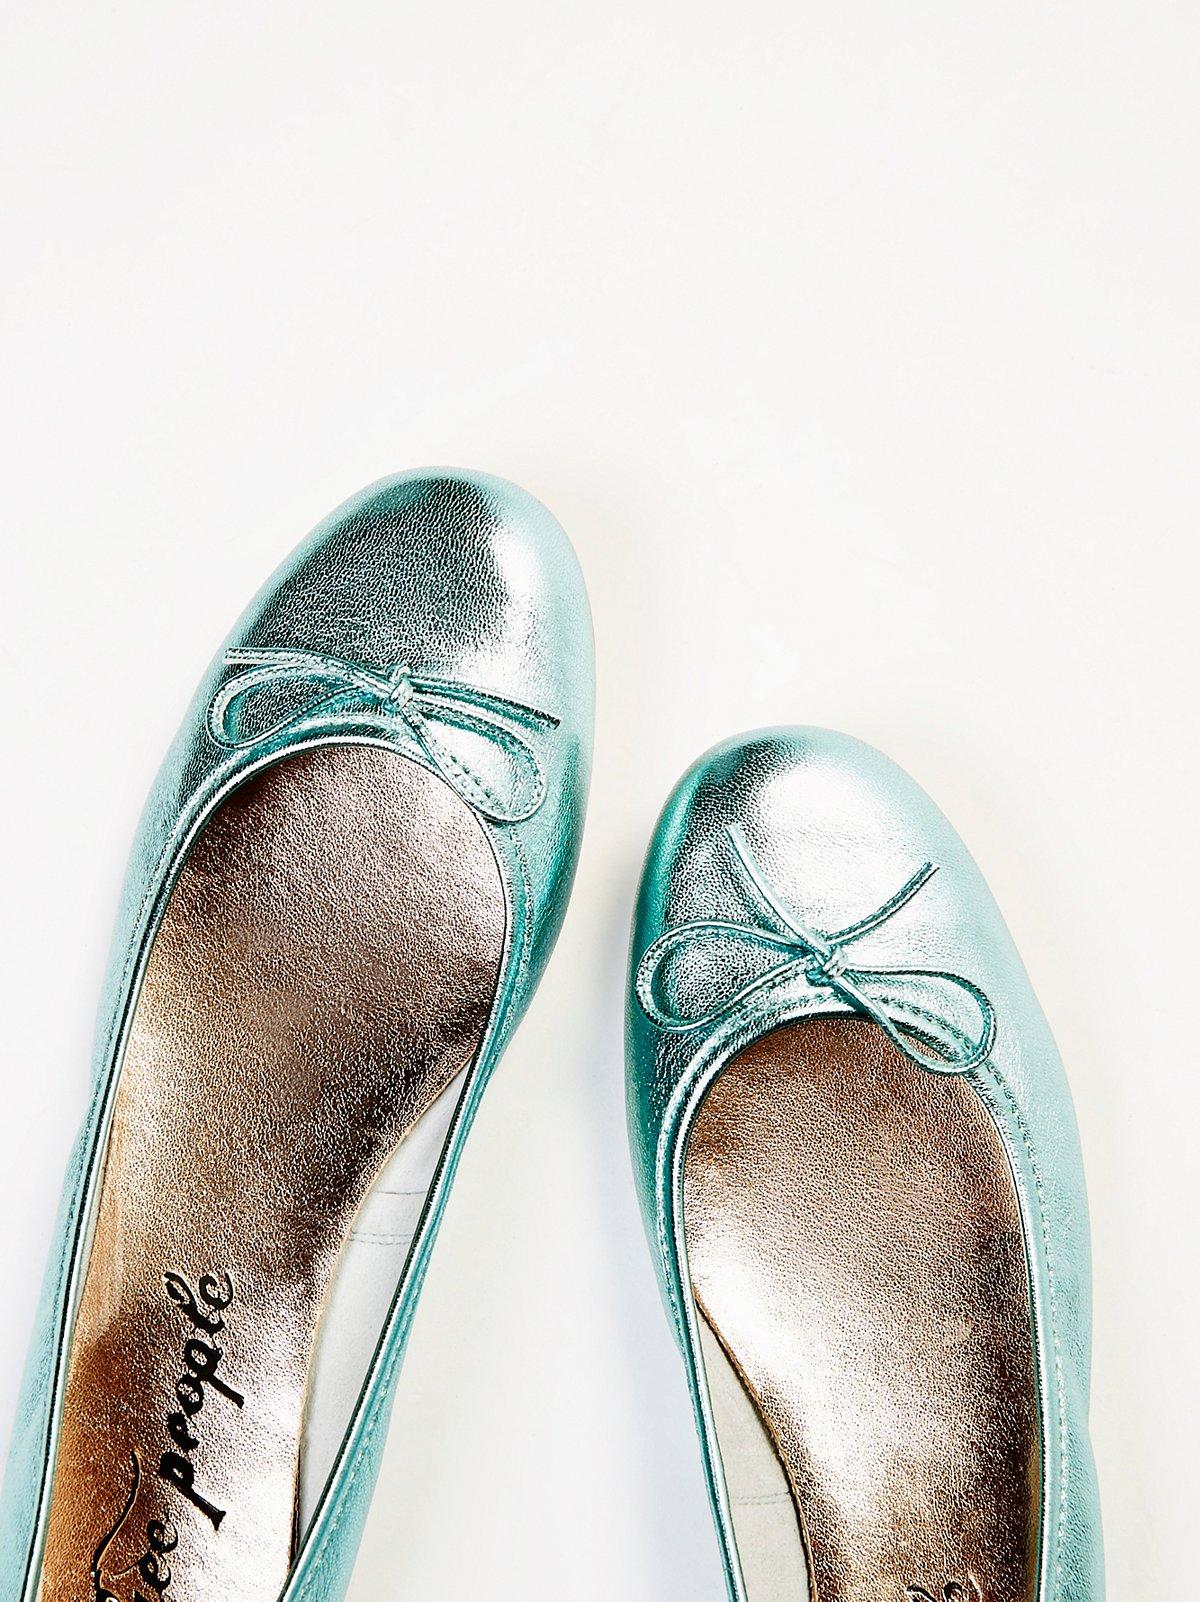 Last Dance芭蕾平底鞋